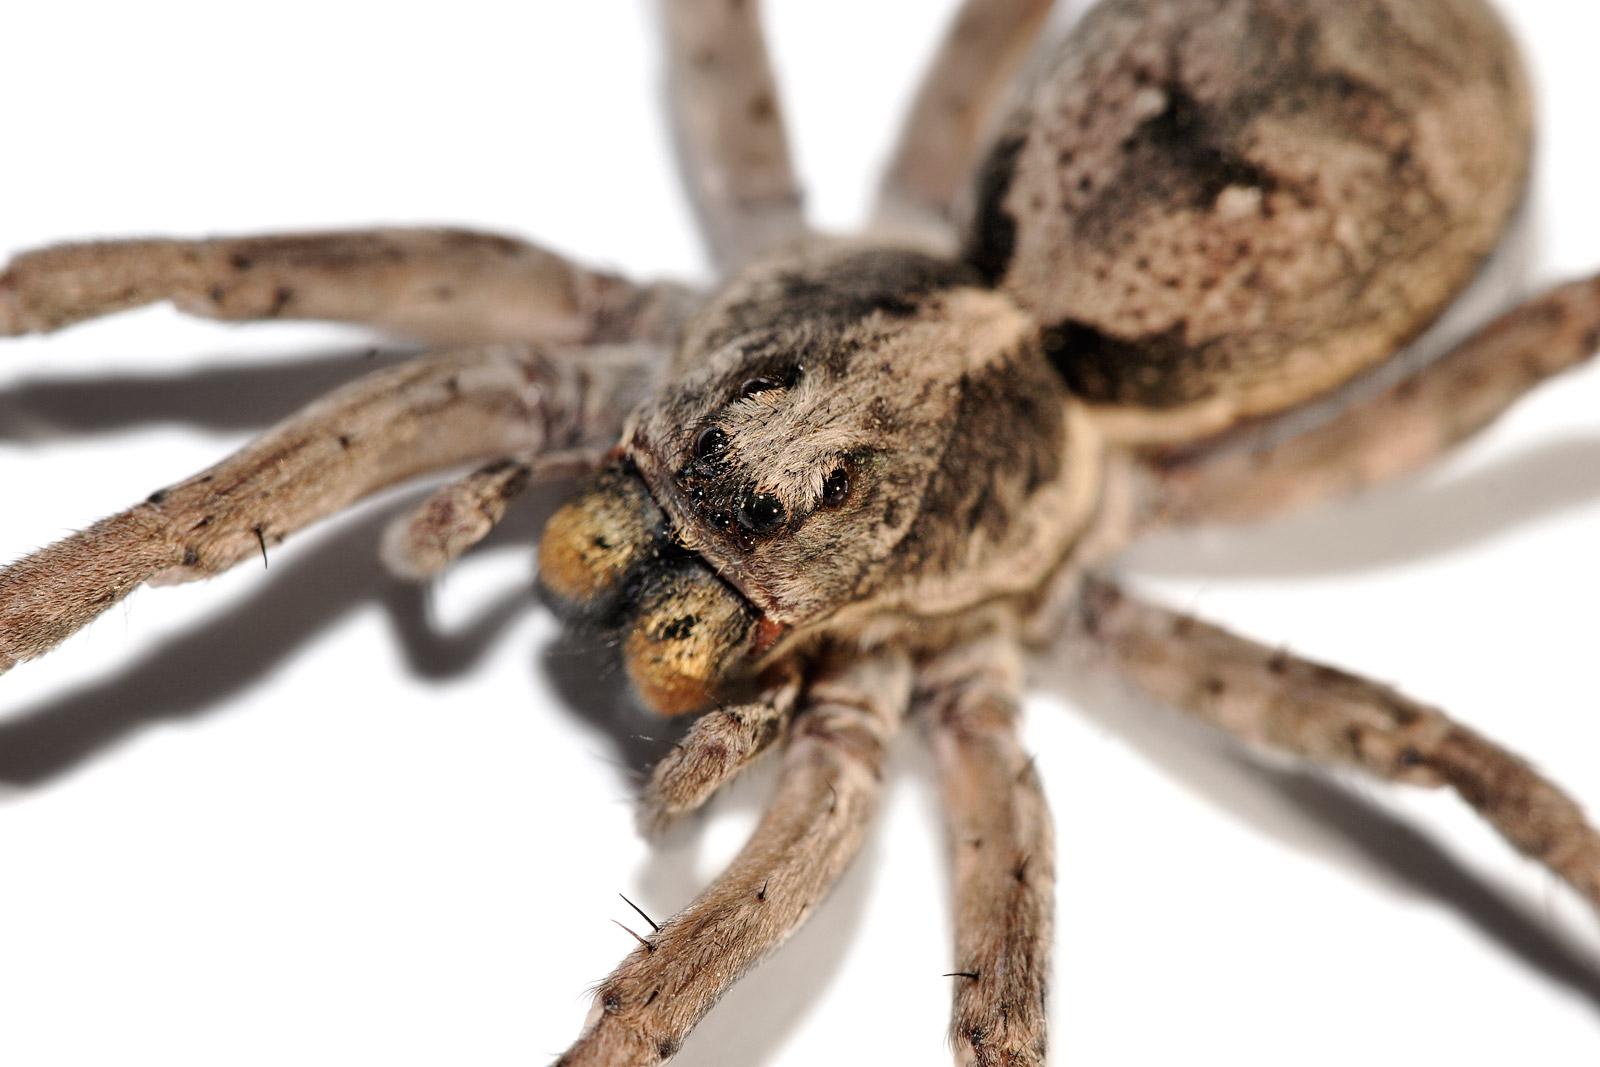 Spider Bite Vs Bed Bug Bites